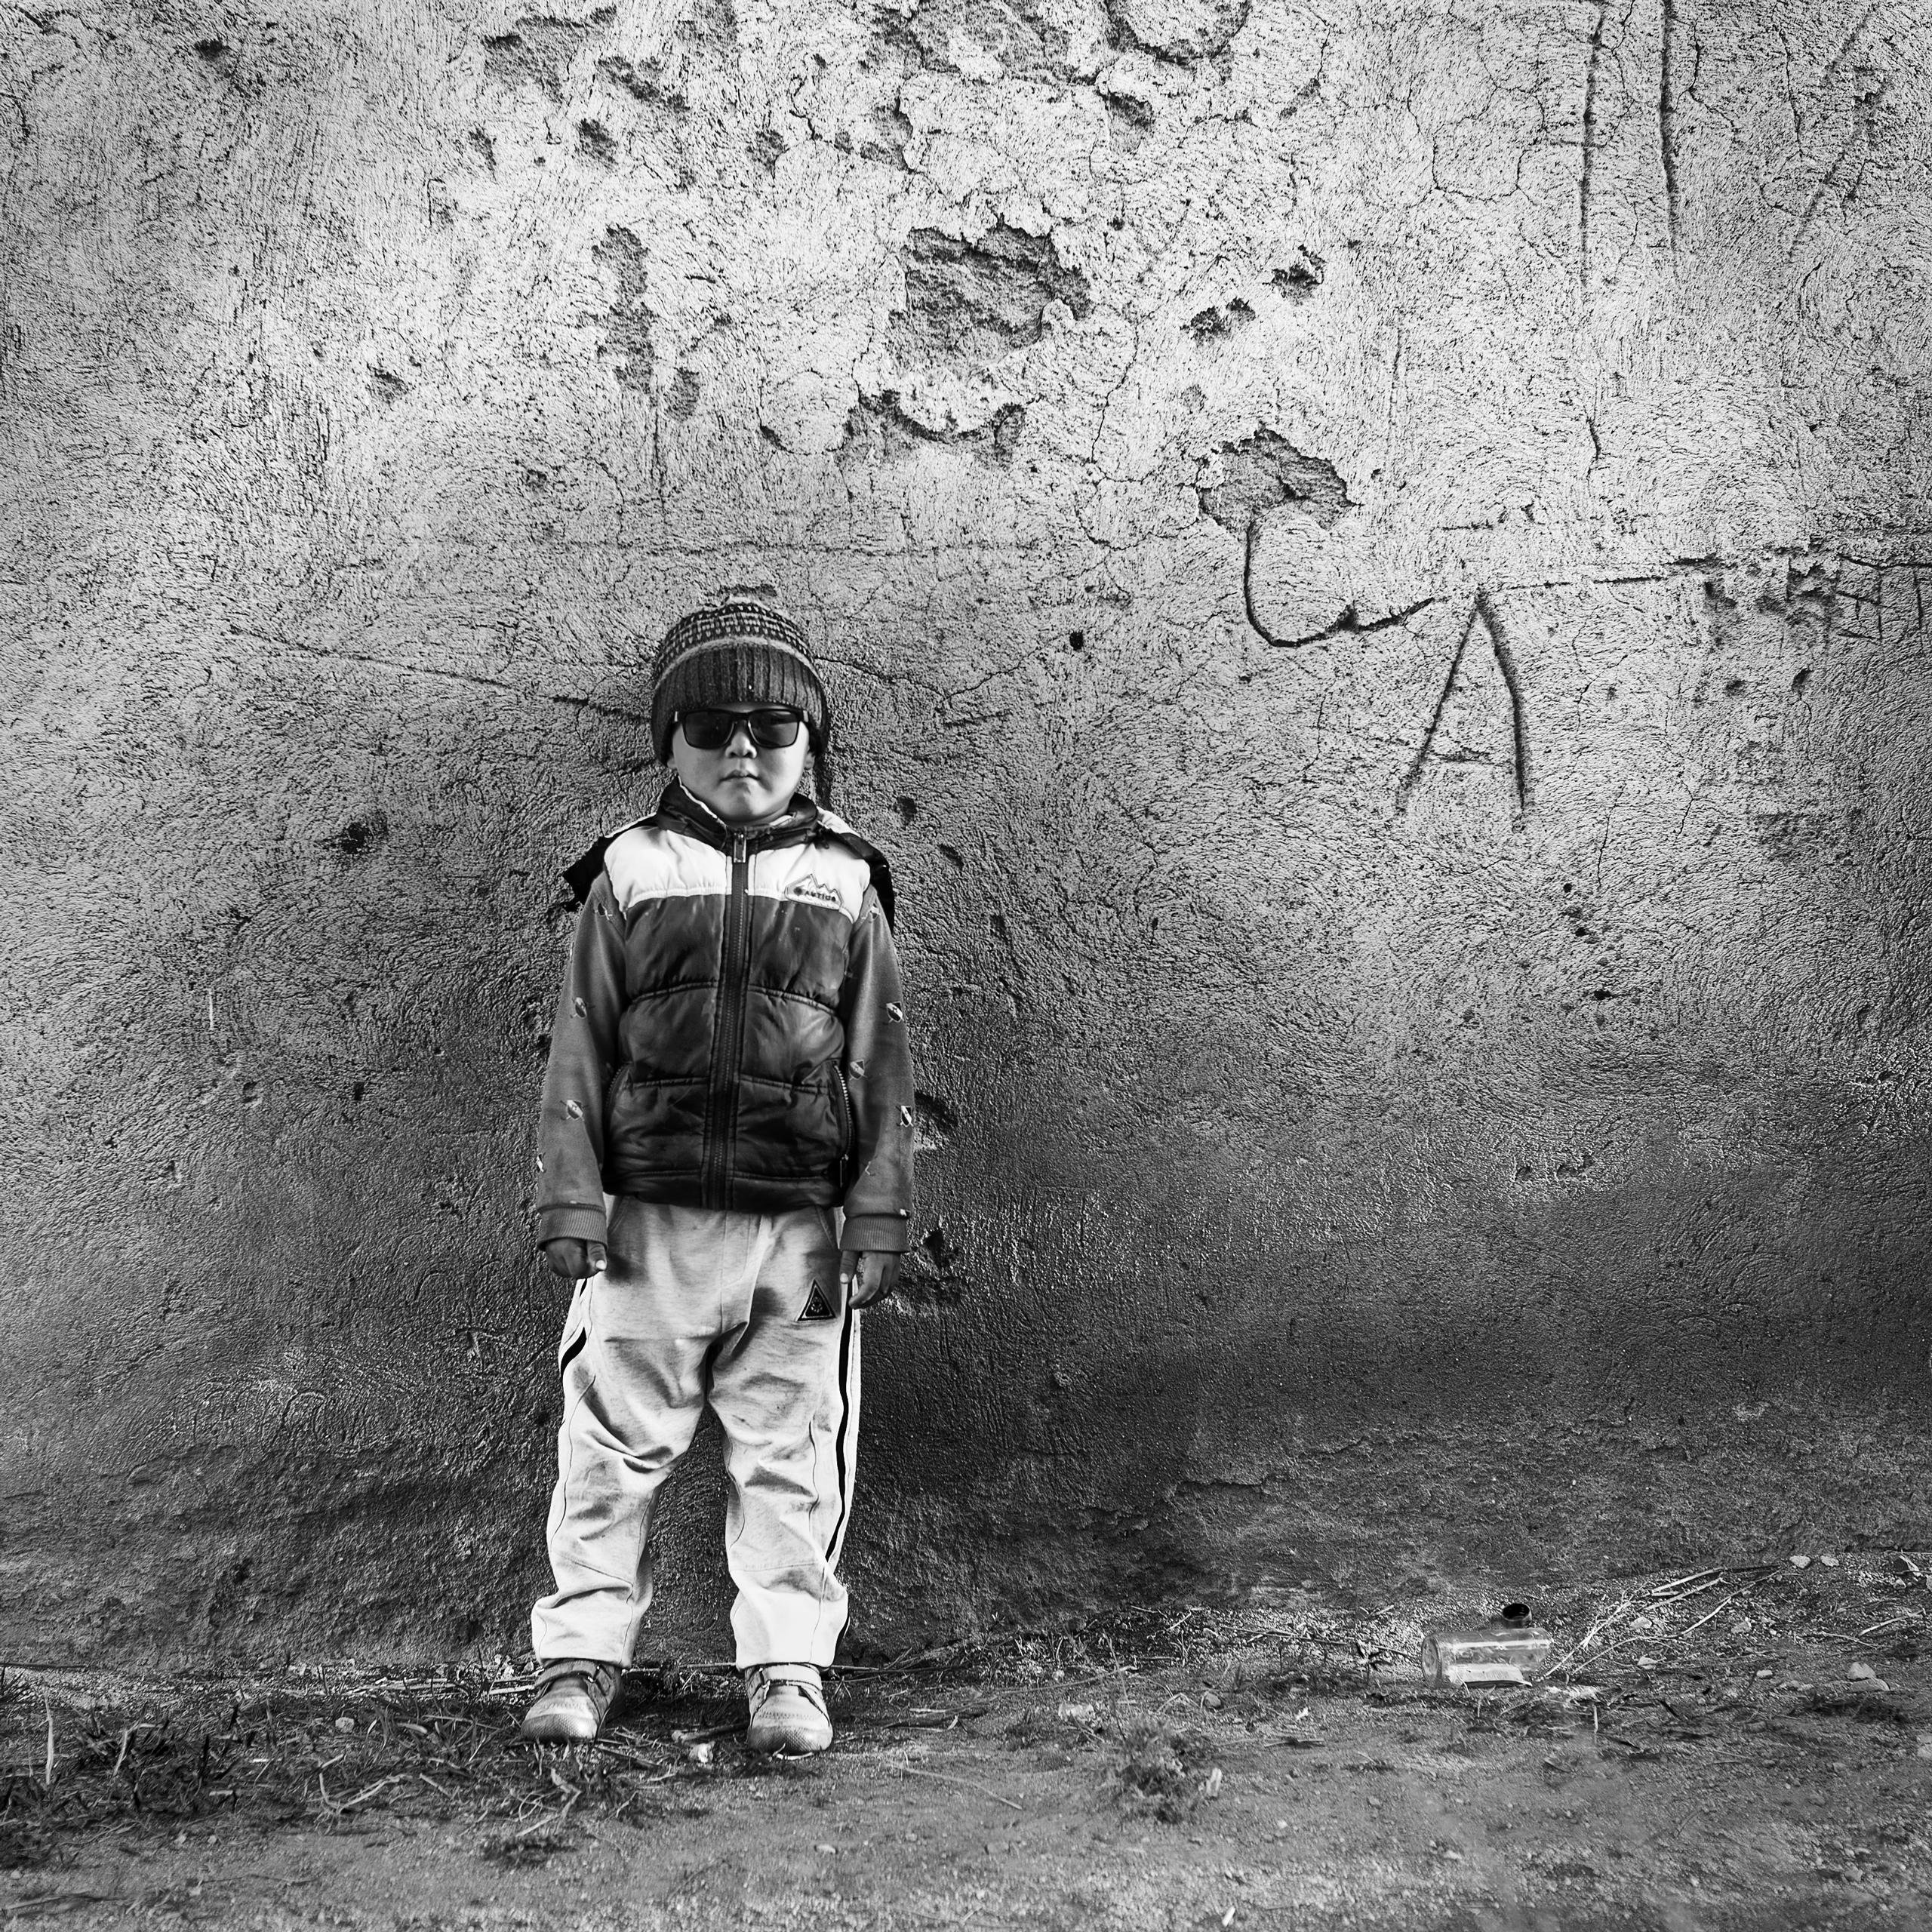 The future of M   Issyk-Kul, KYRGYZ, モノクロの作品,壁の前に立つ少年